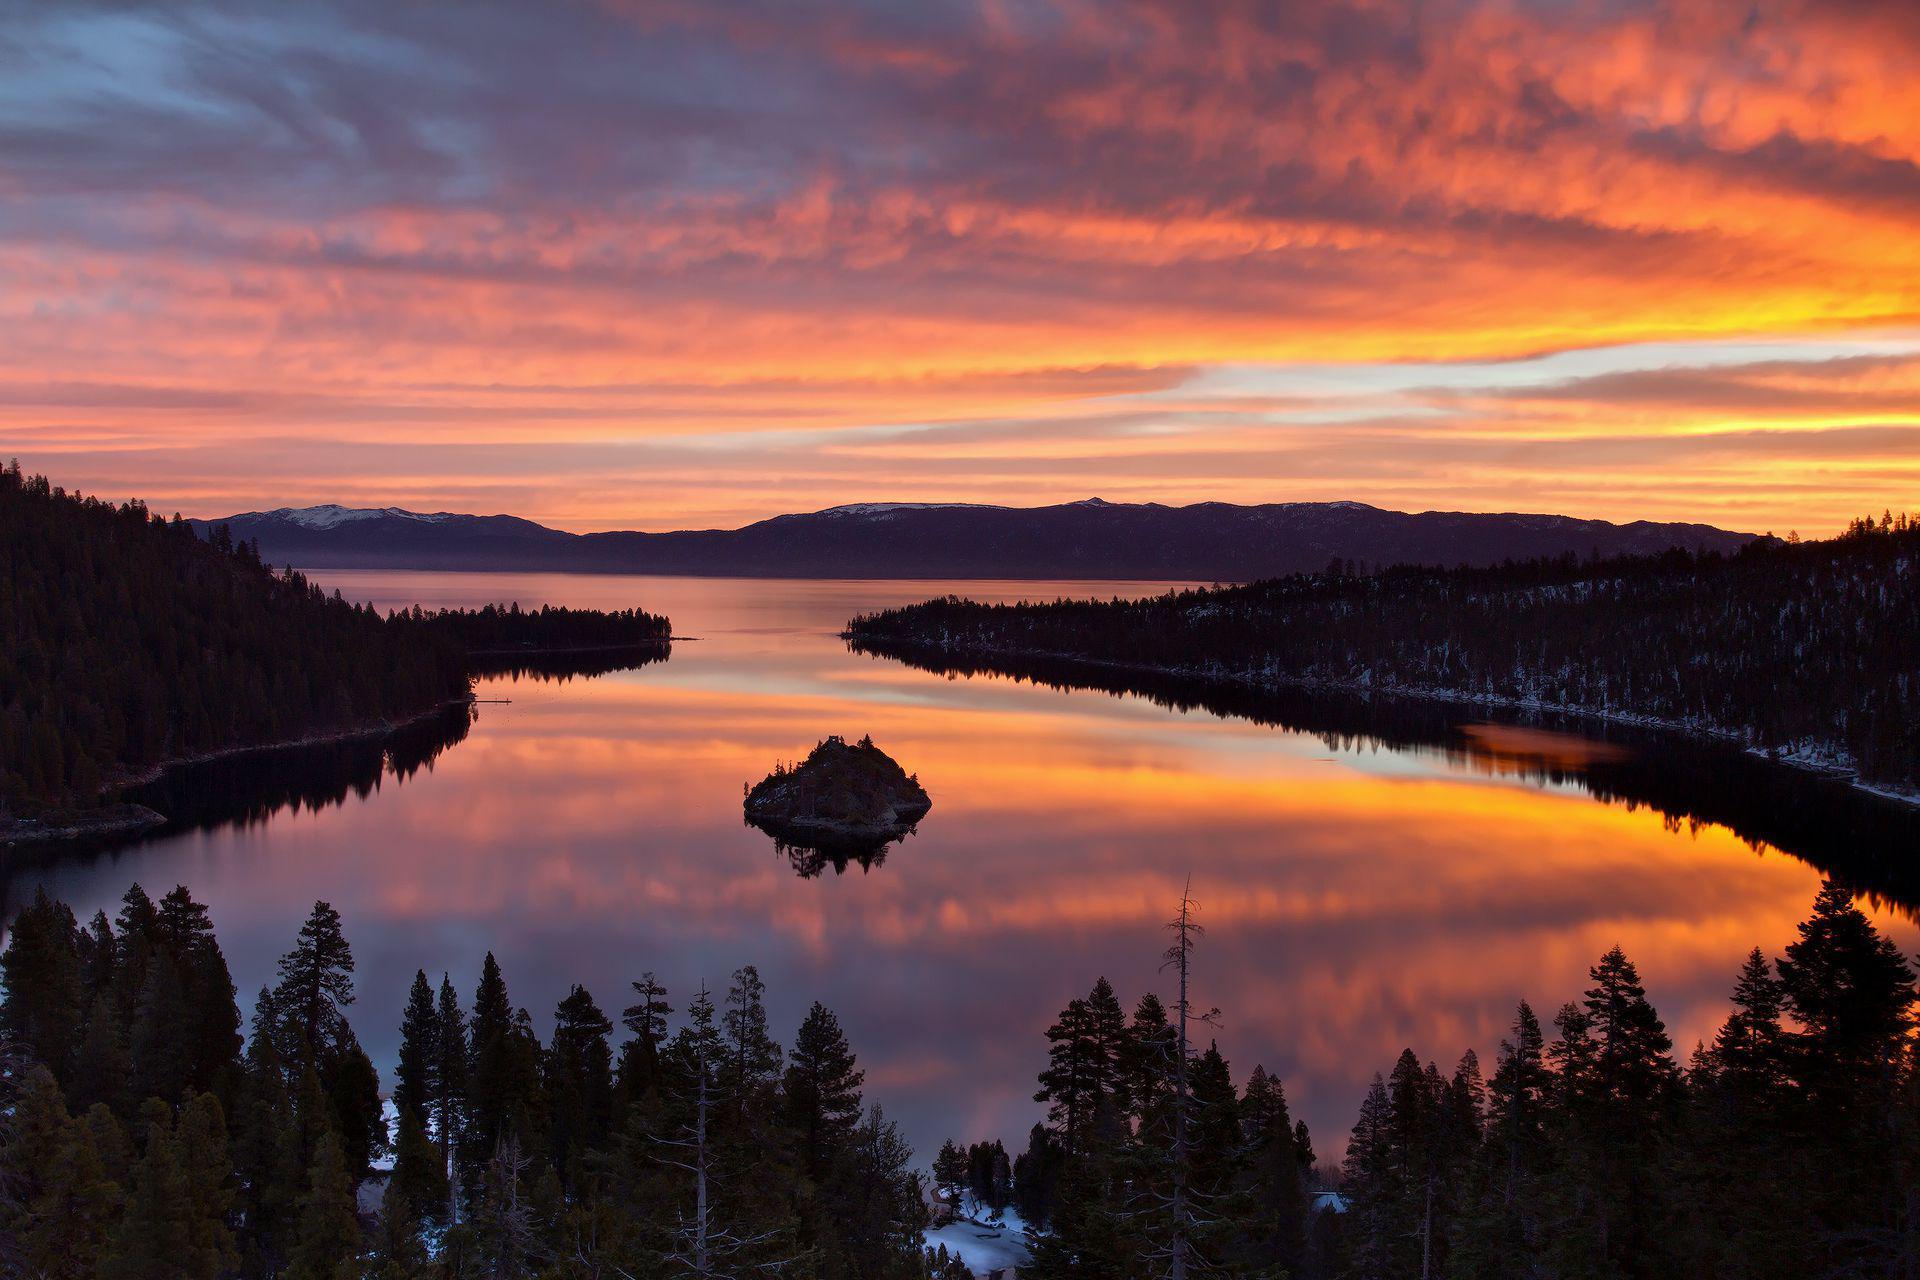 SCIENTISTS: Lake Tahoe Sees Record-Breaking Year in 2015 ...